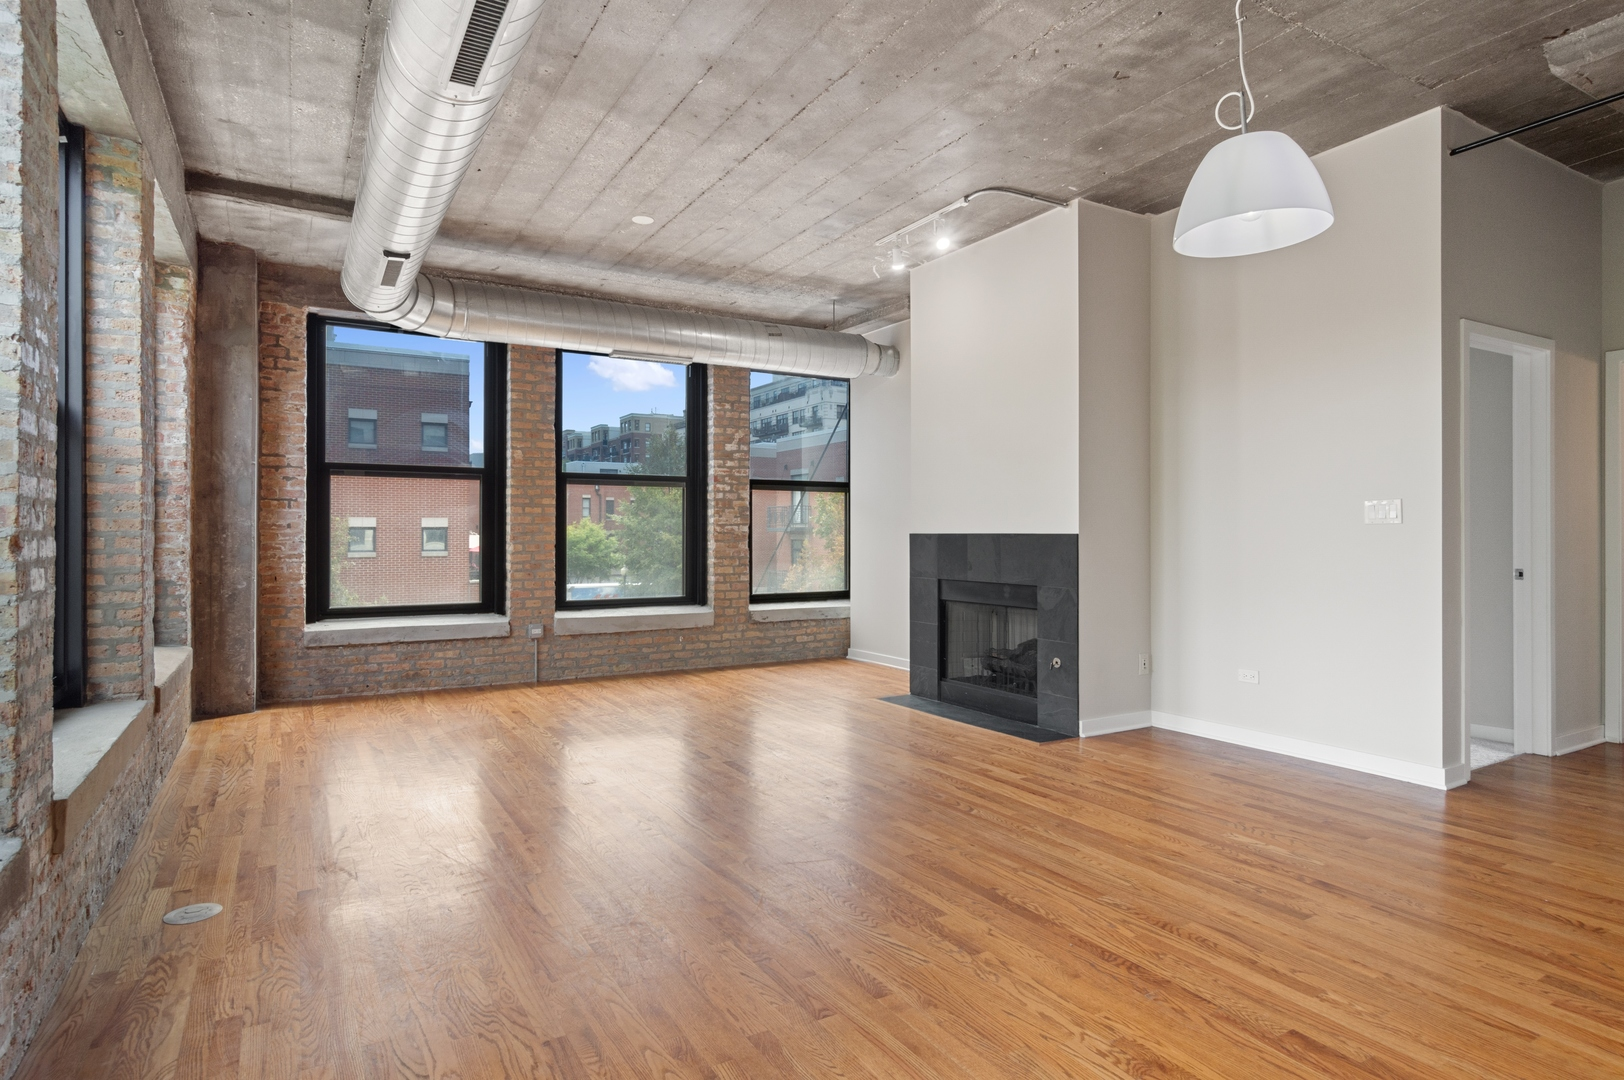 1001 W 15th St apartments for rent at AptAmigo